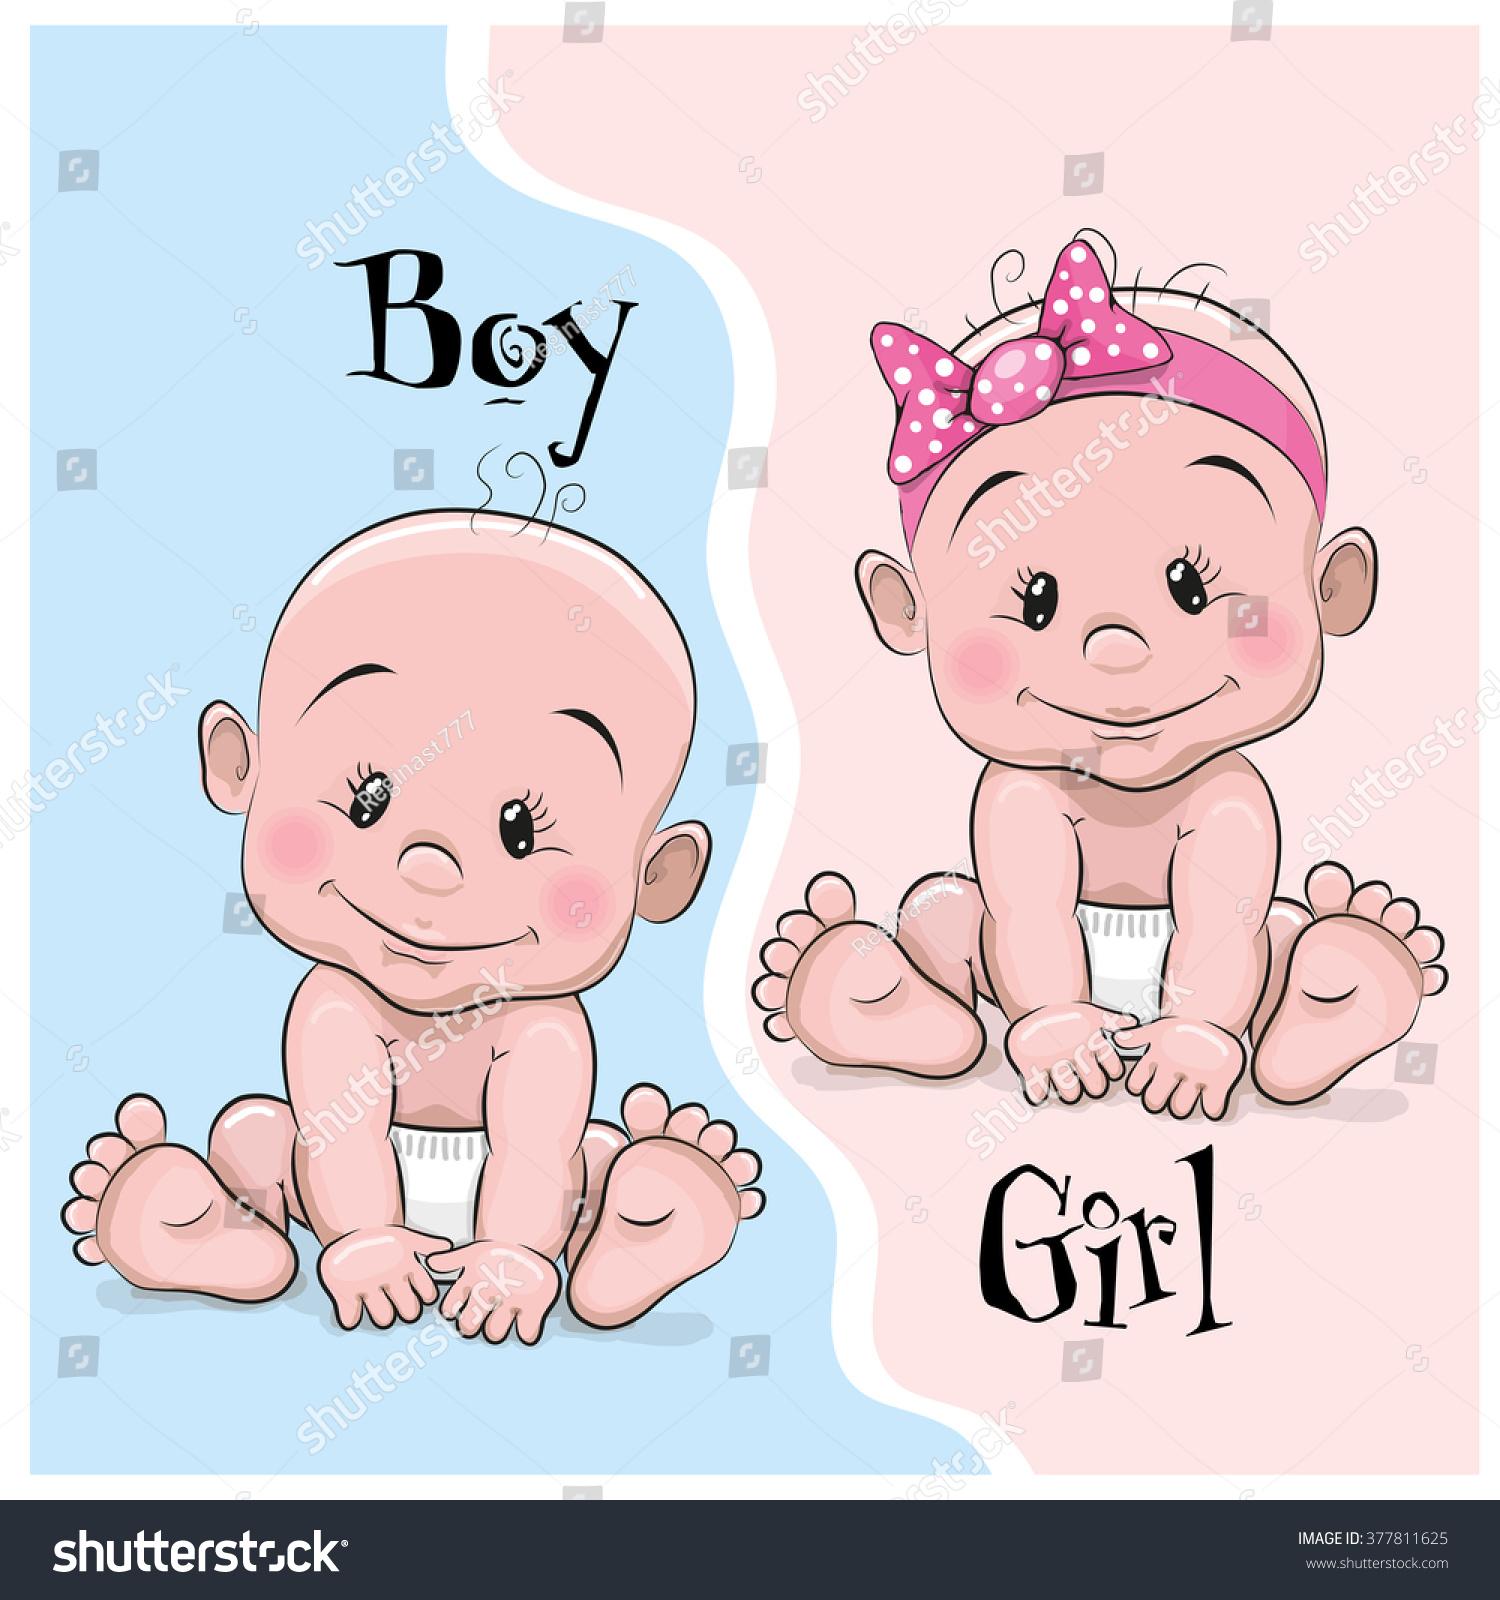 Two Cute Cartoon Babies Boy Girl Stock Vector 377811625 - Shutterstock-9984